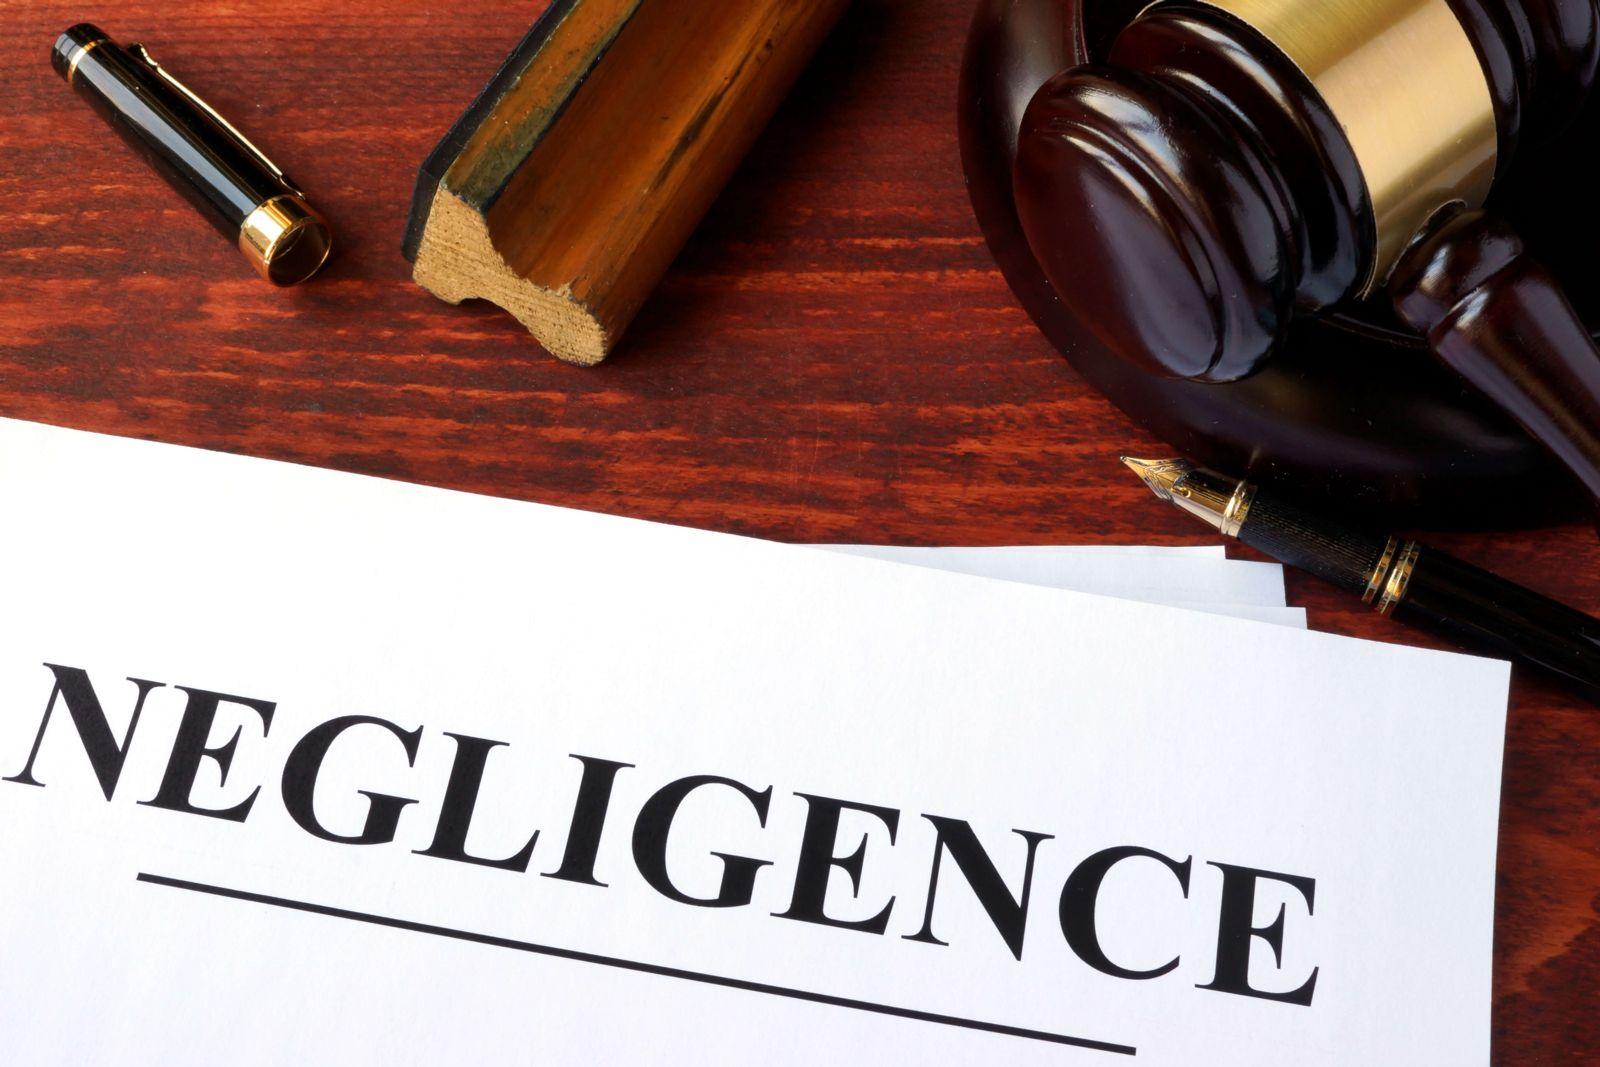 Legal Negligence